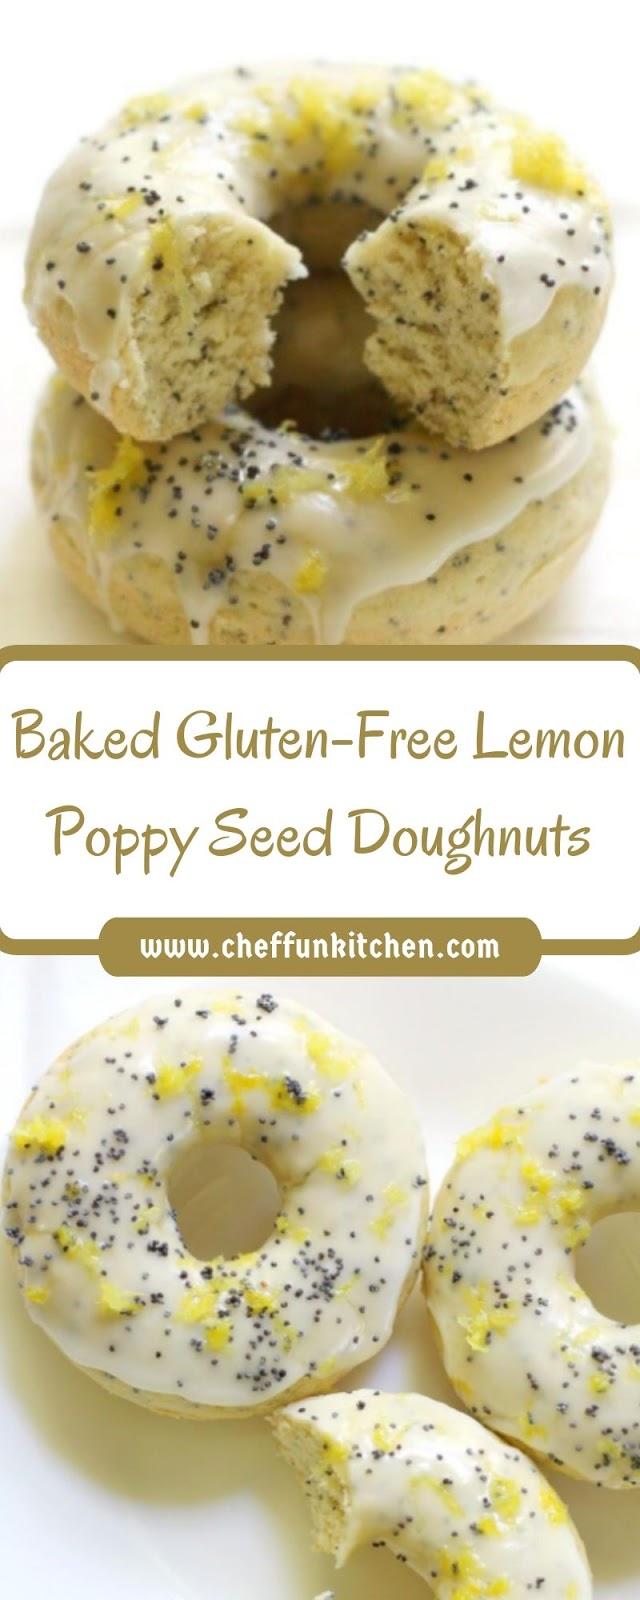 Baked Gluten-Free Lemon Poppy Seed Doughnuts